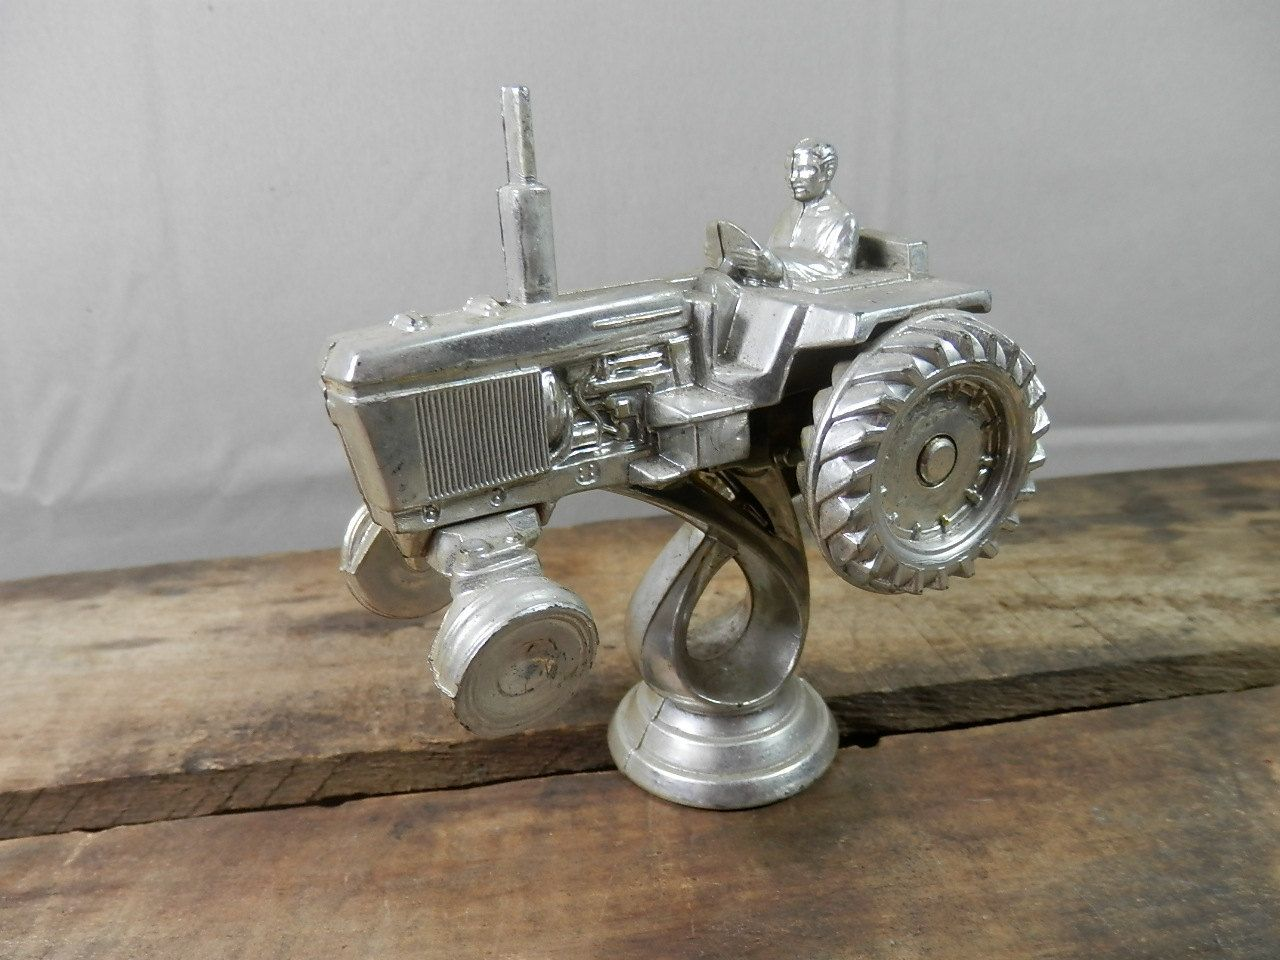 Farm Tractor Hood Ornament : Vintage tractor hood ornament trophy topper redneck craft